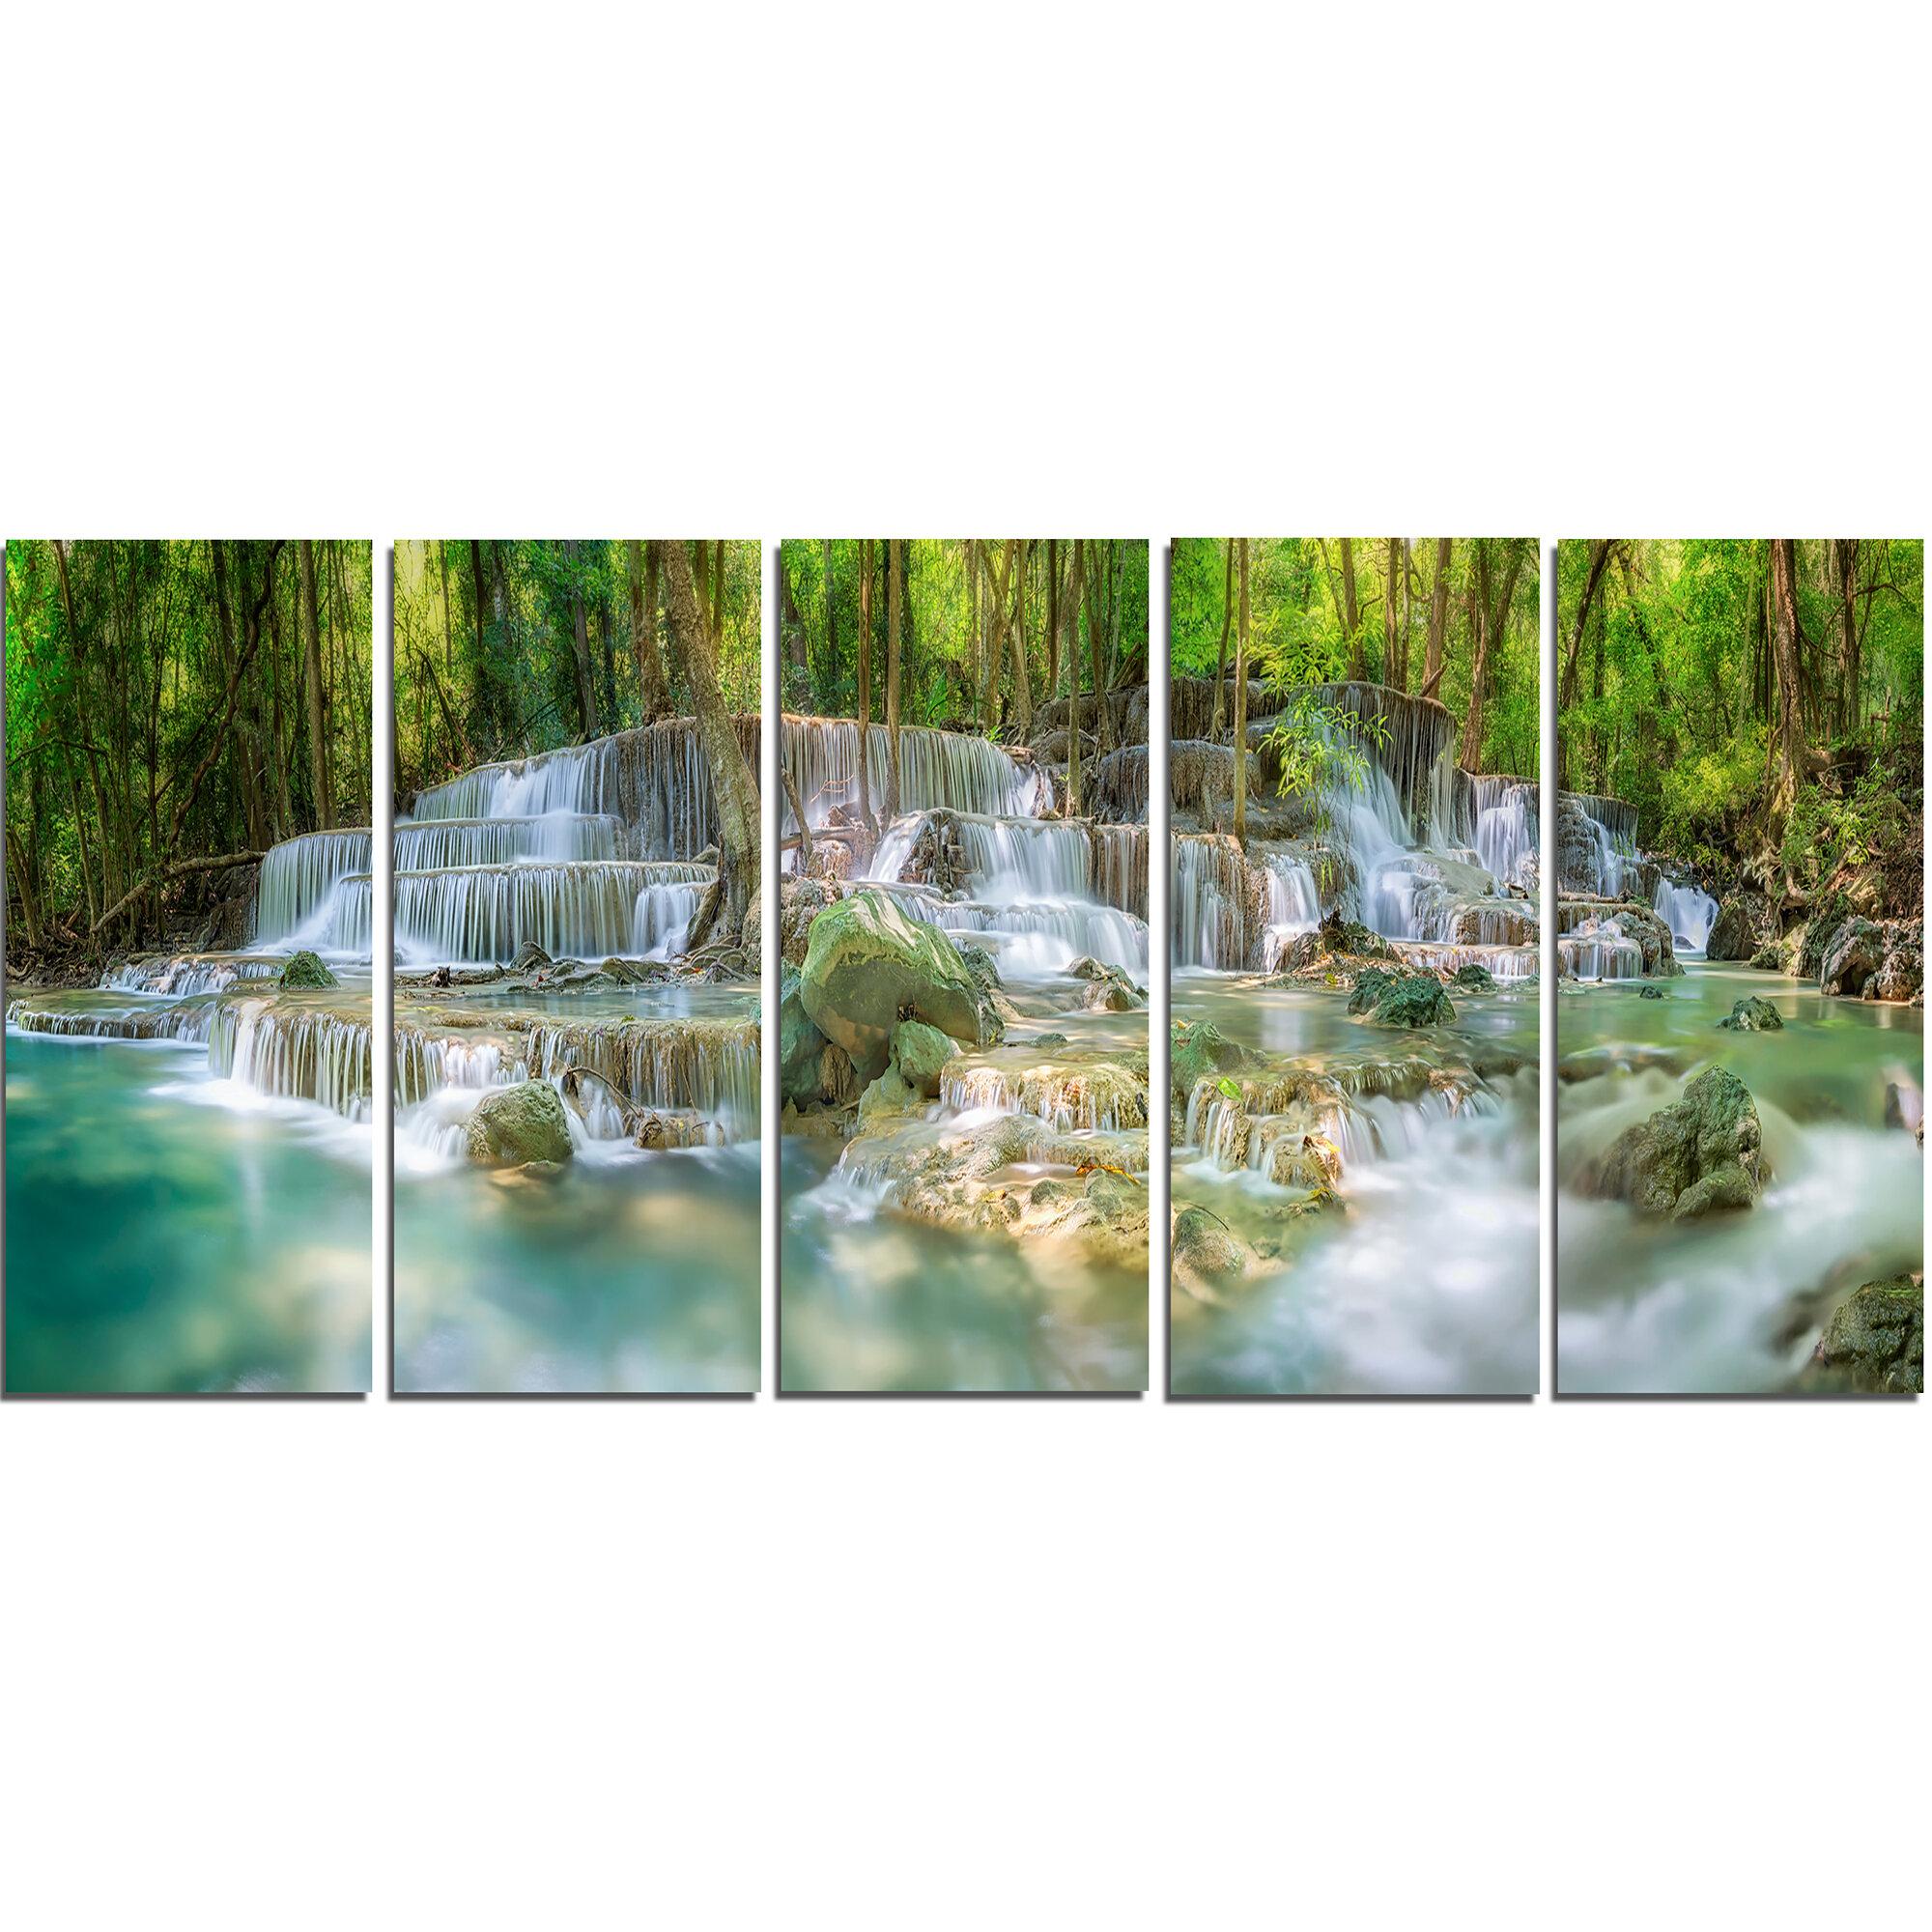 Designart Level 6 Of Huaimaekamin Waterfall 5 Piece Wall Art On Wrapped Canvas Set Wayfair